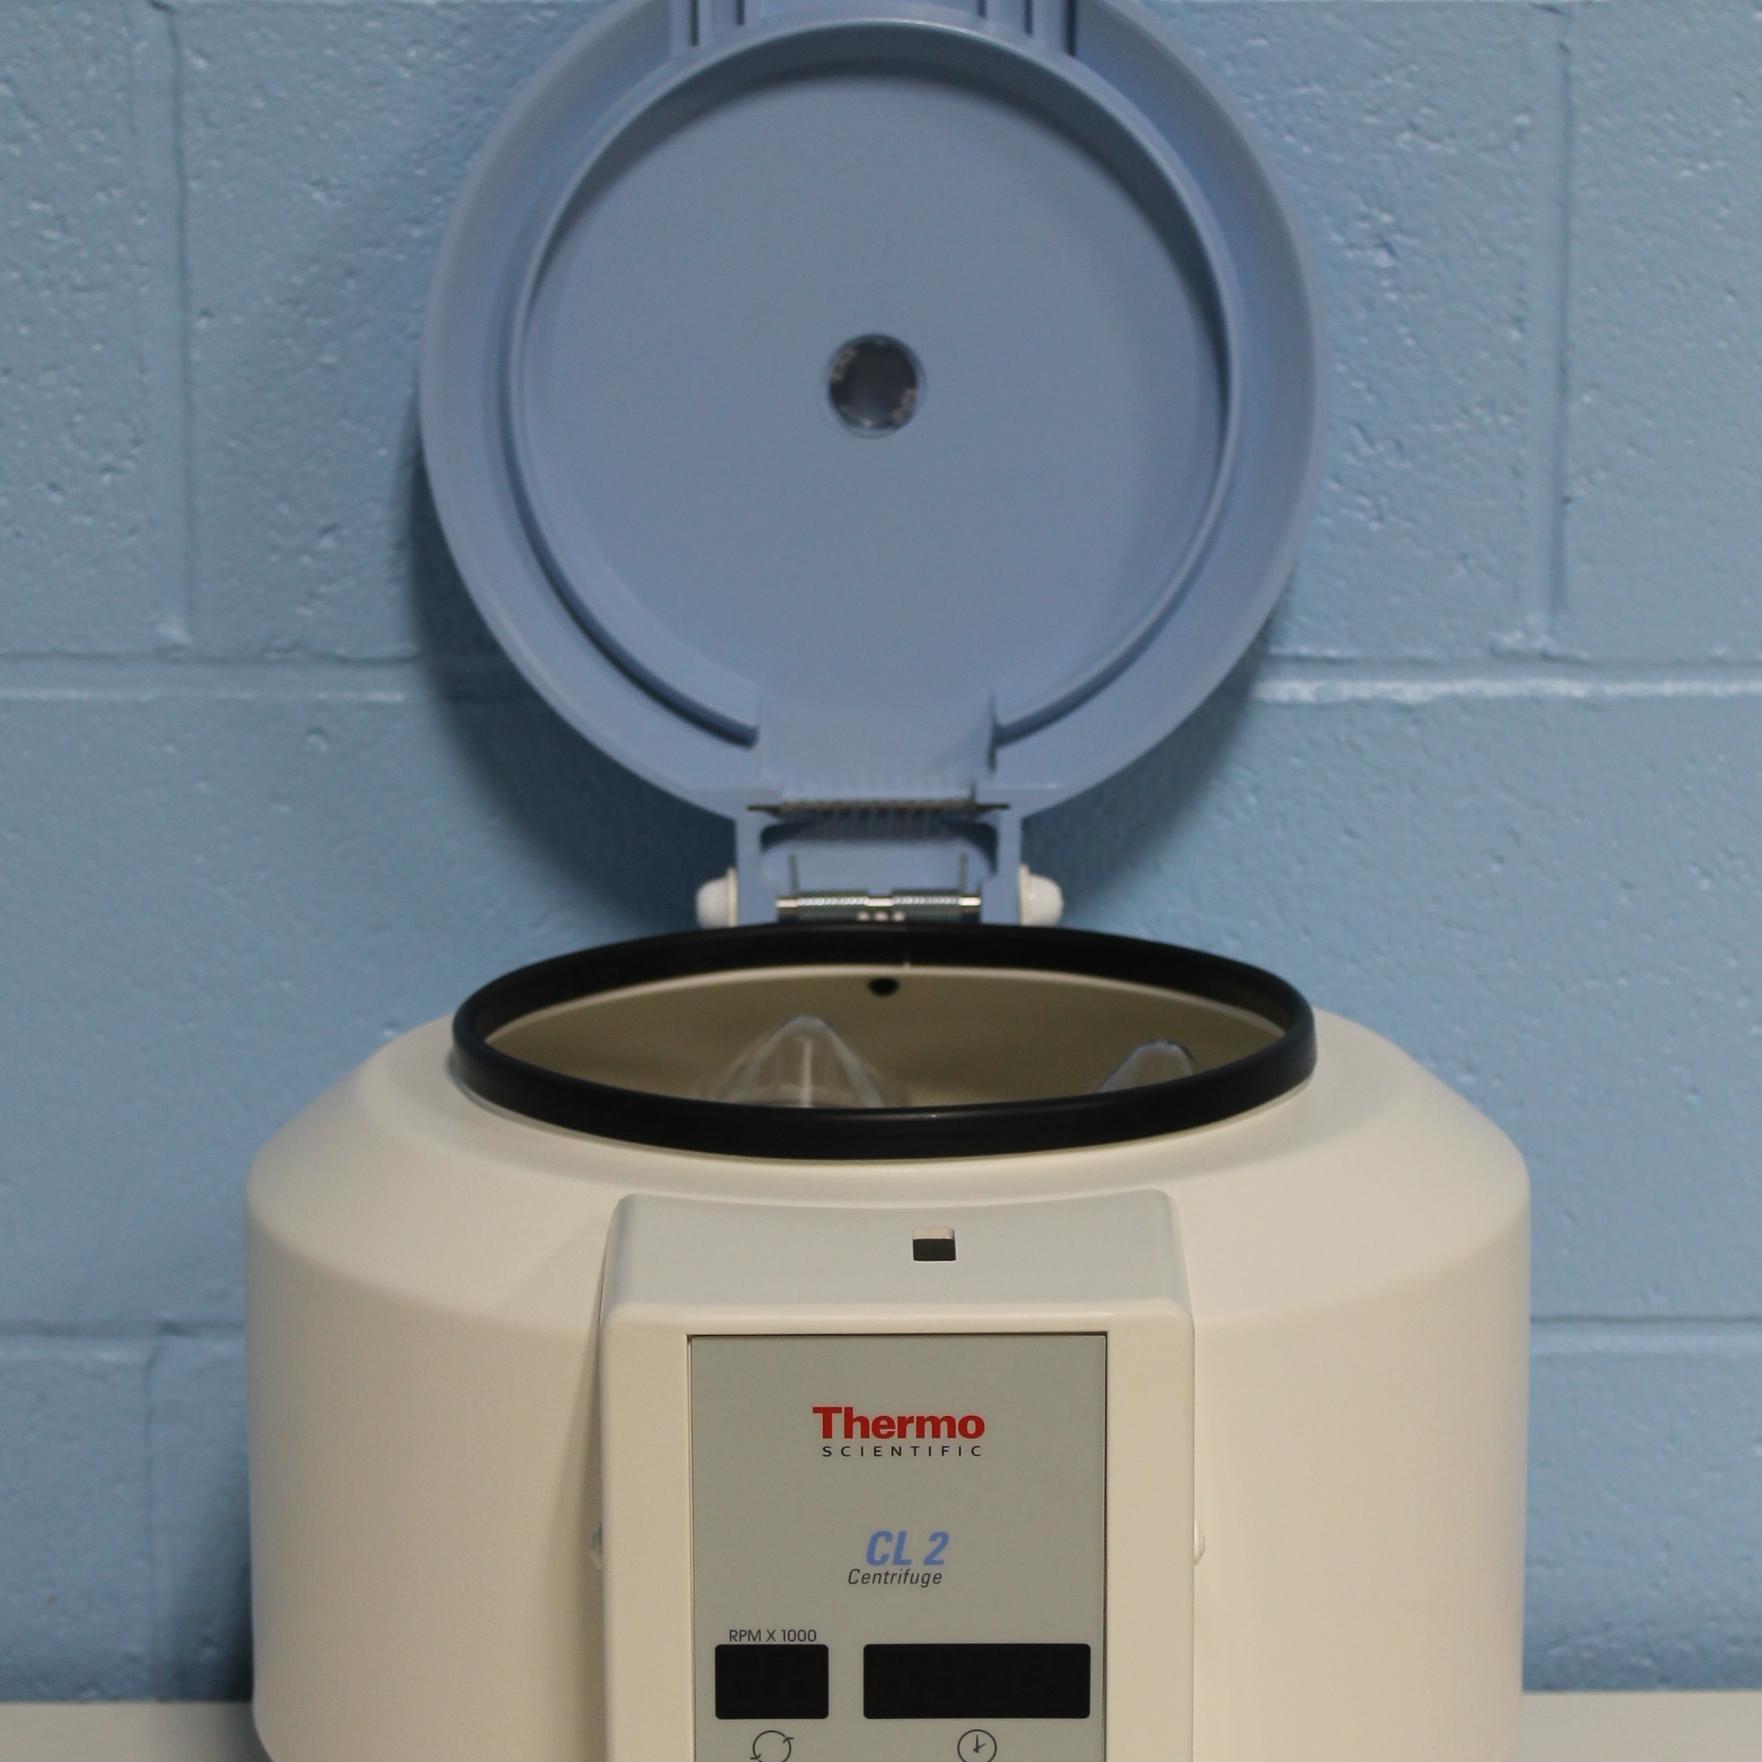 Thermo Scientific CL 2 Centrifuge Image